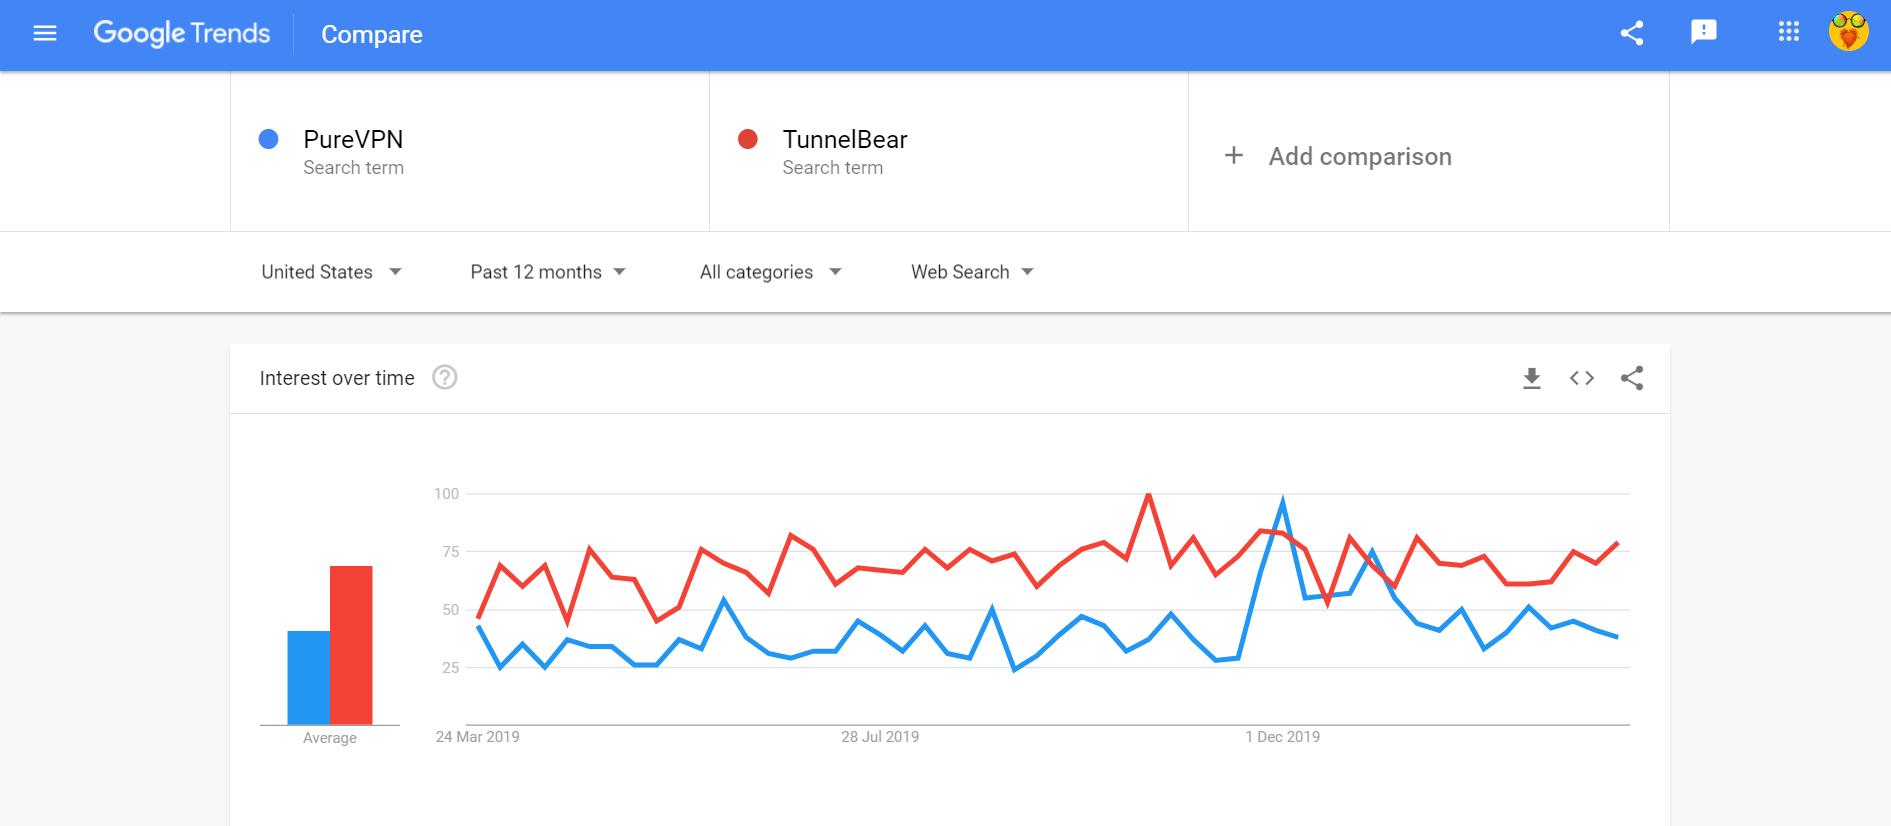 Google trends compare PureVPN vs TunnelBear